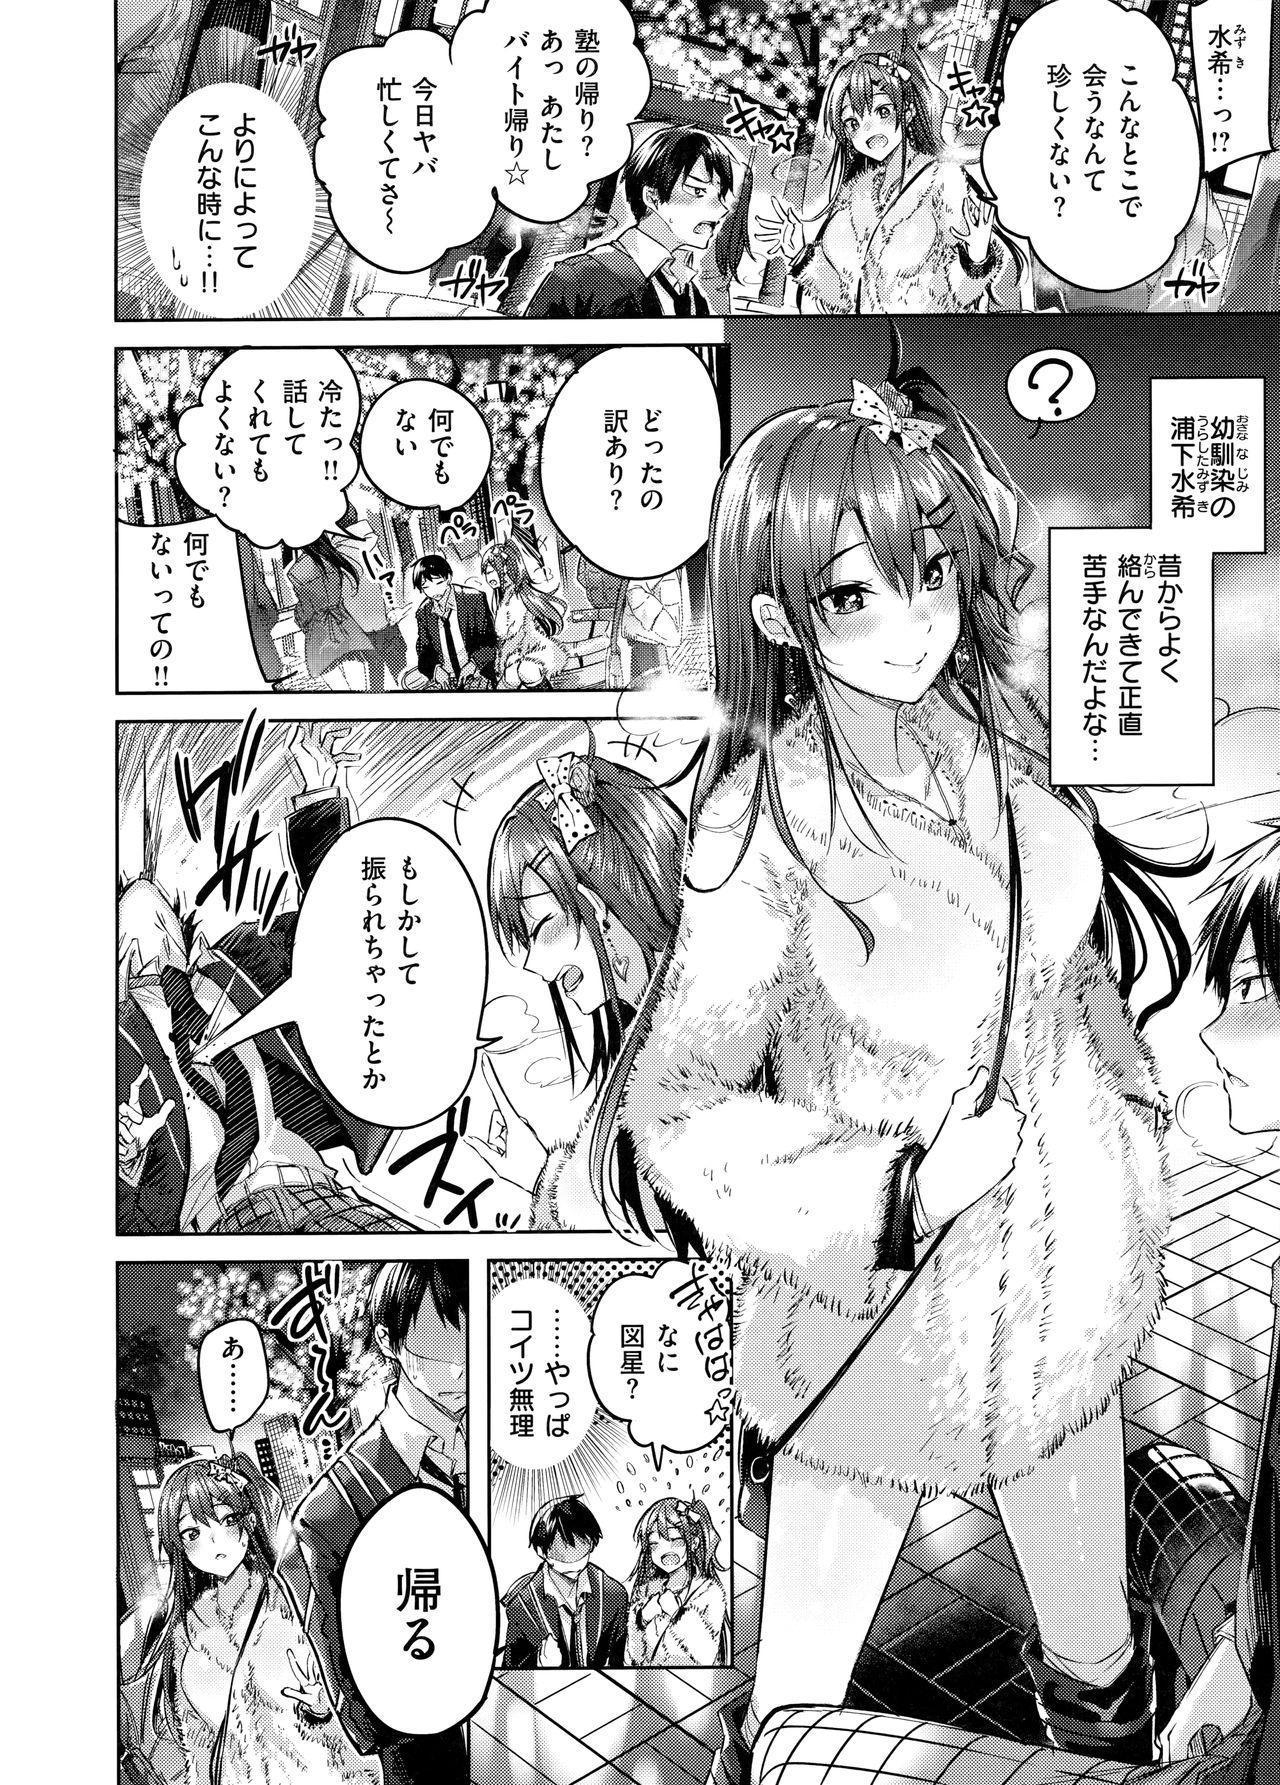 Nakadashi Strike! - Winning strike! 11